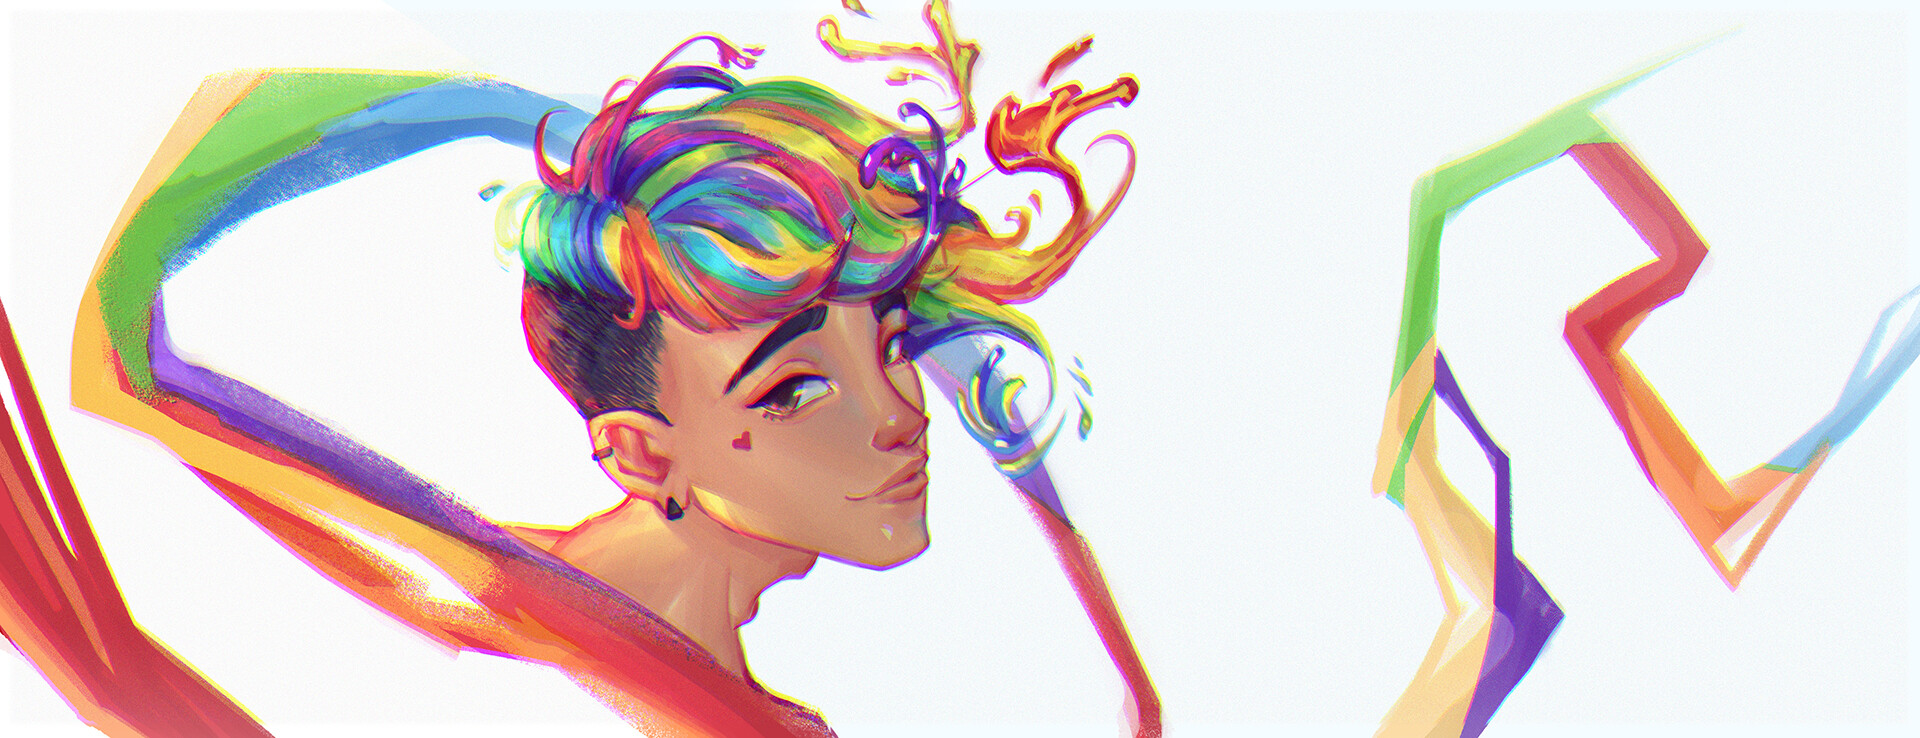 2019 Pride Illustration